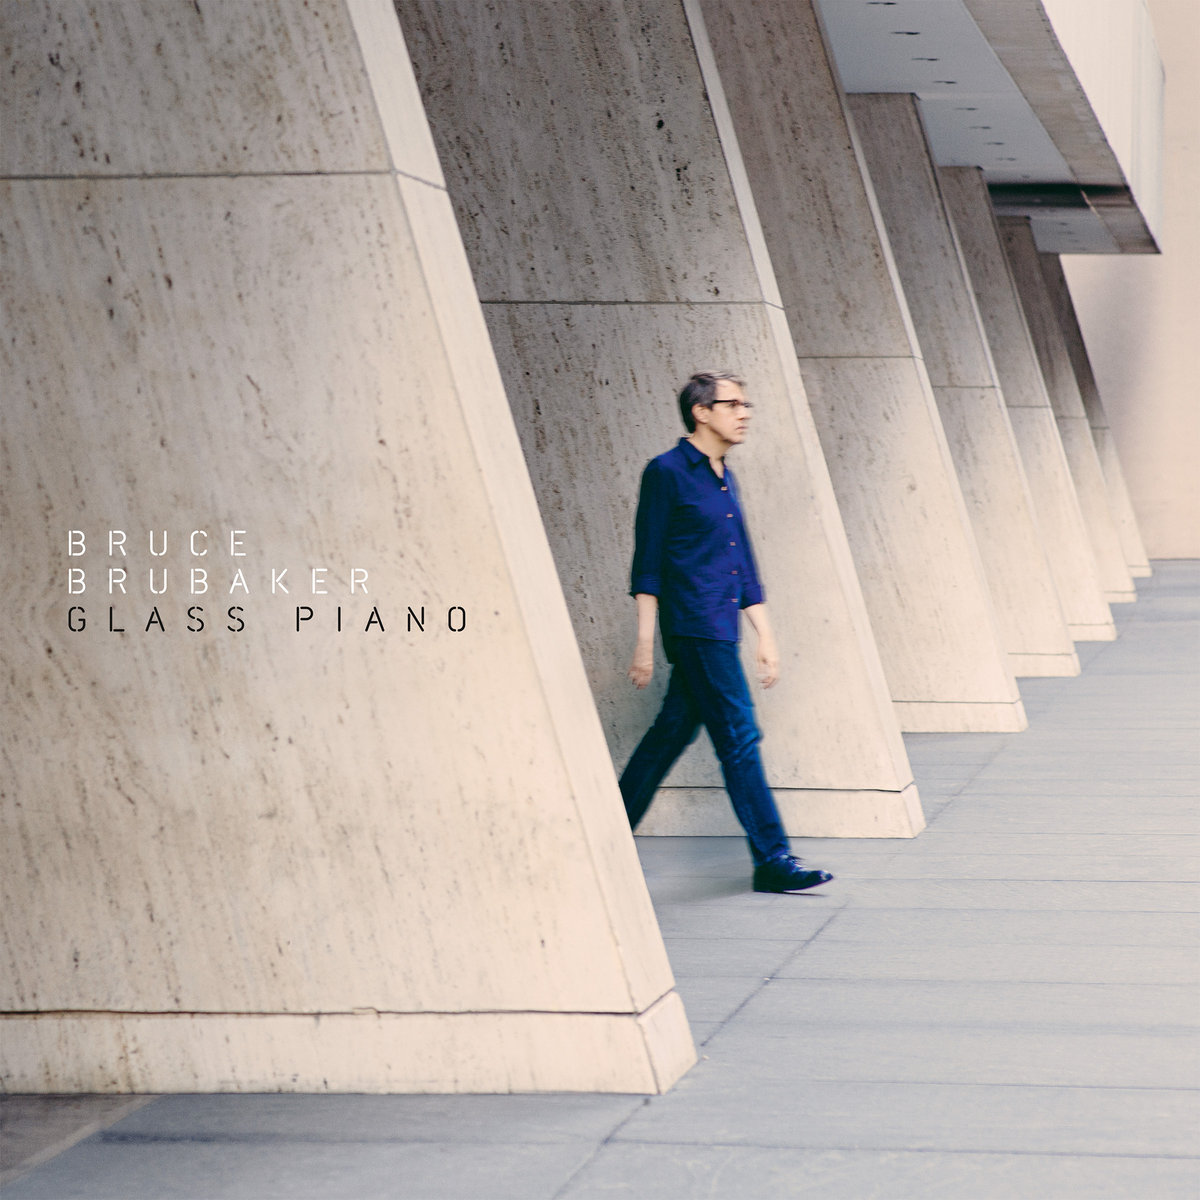 Glass Piano | Bruce Brubaker